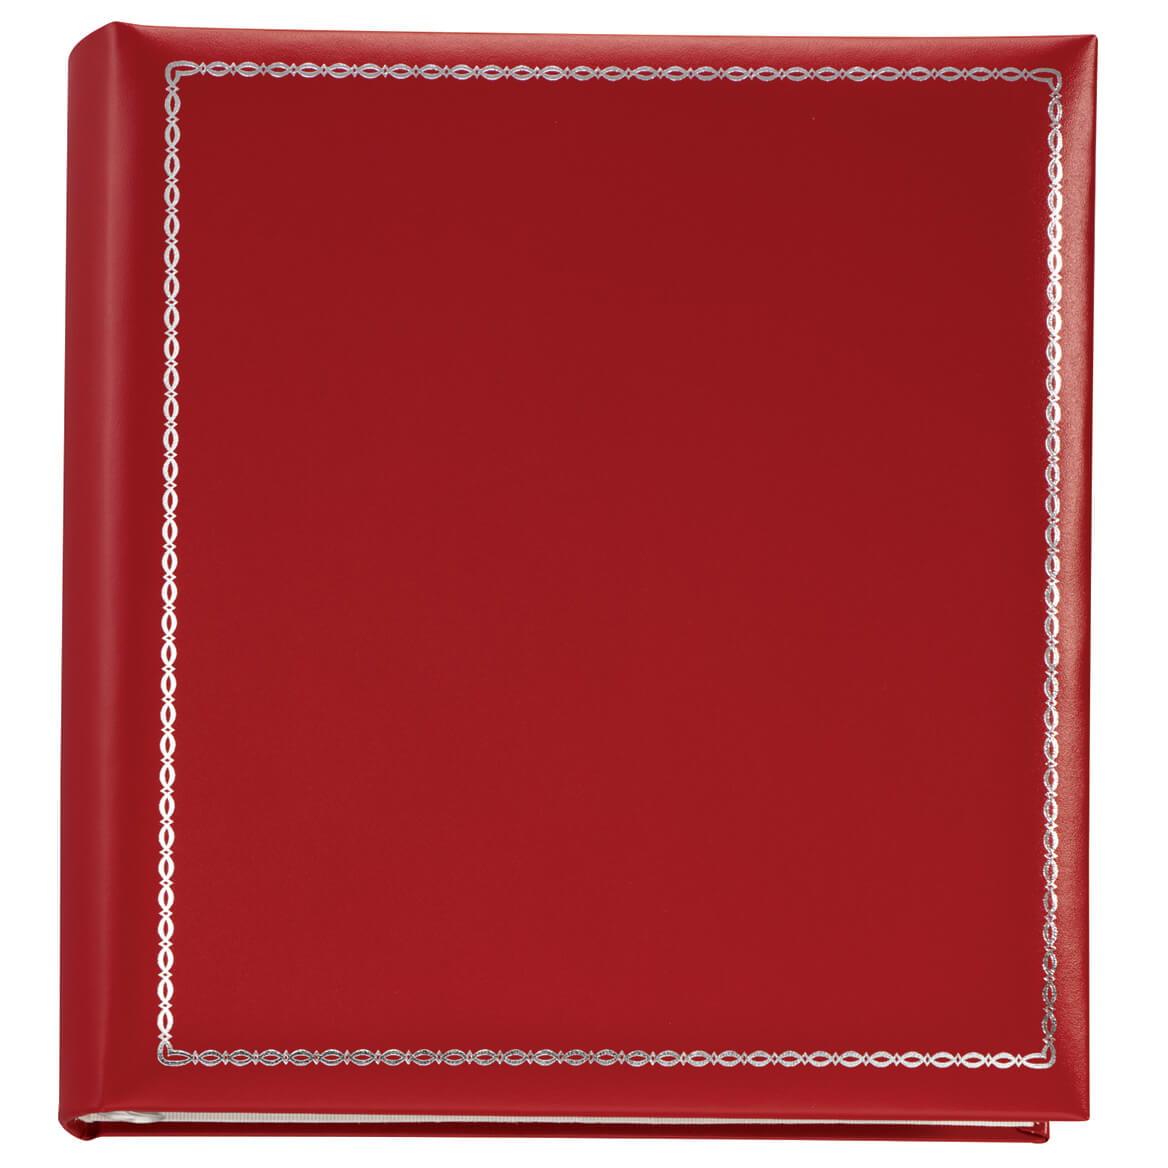 Felicity 3-ring Photo Album Gift Set, Red